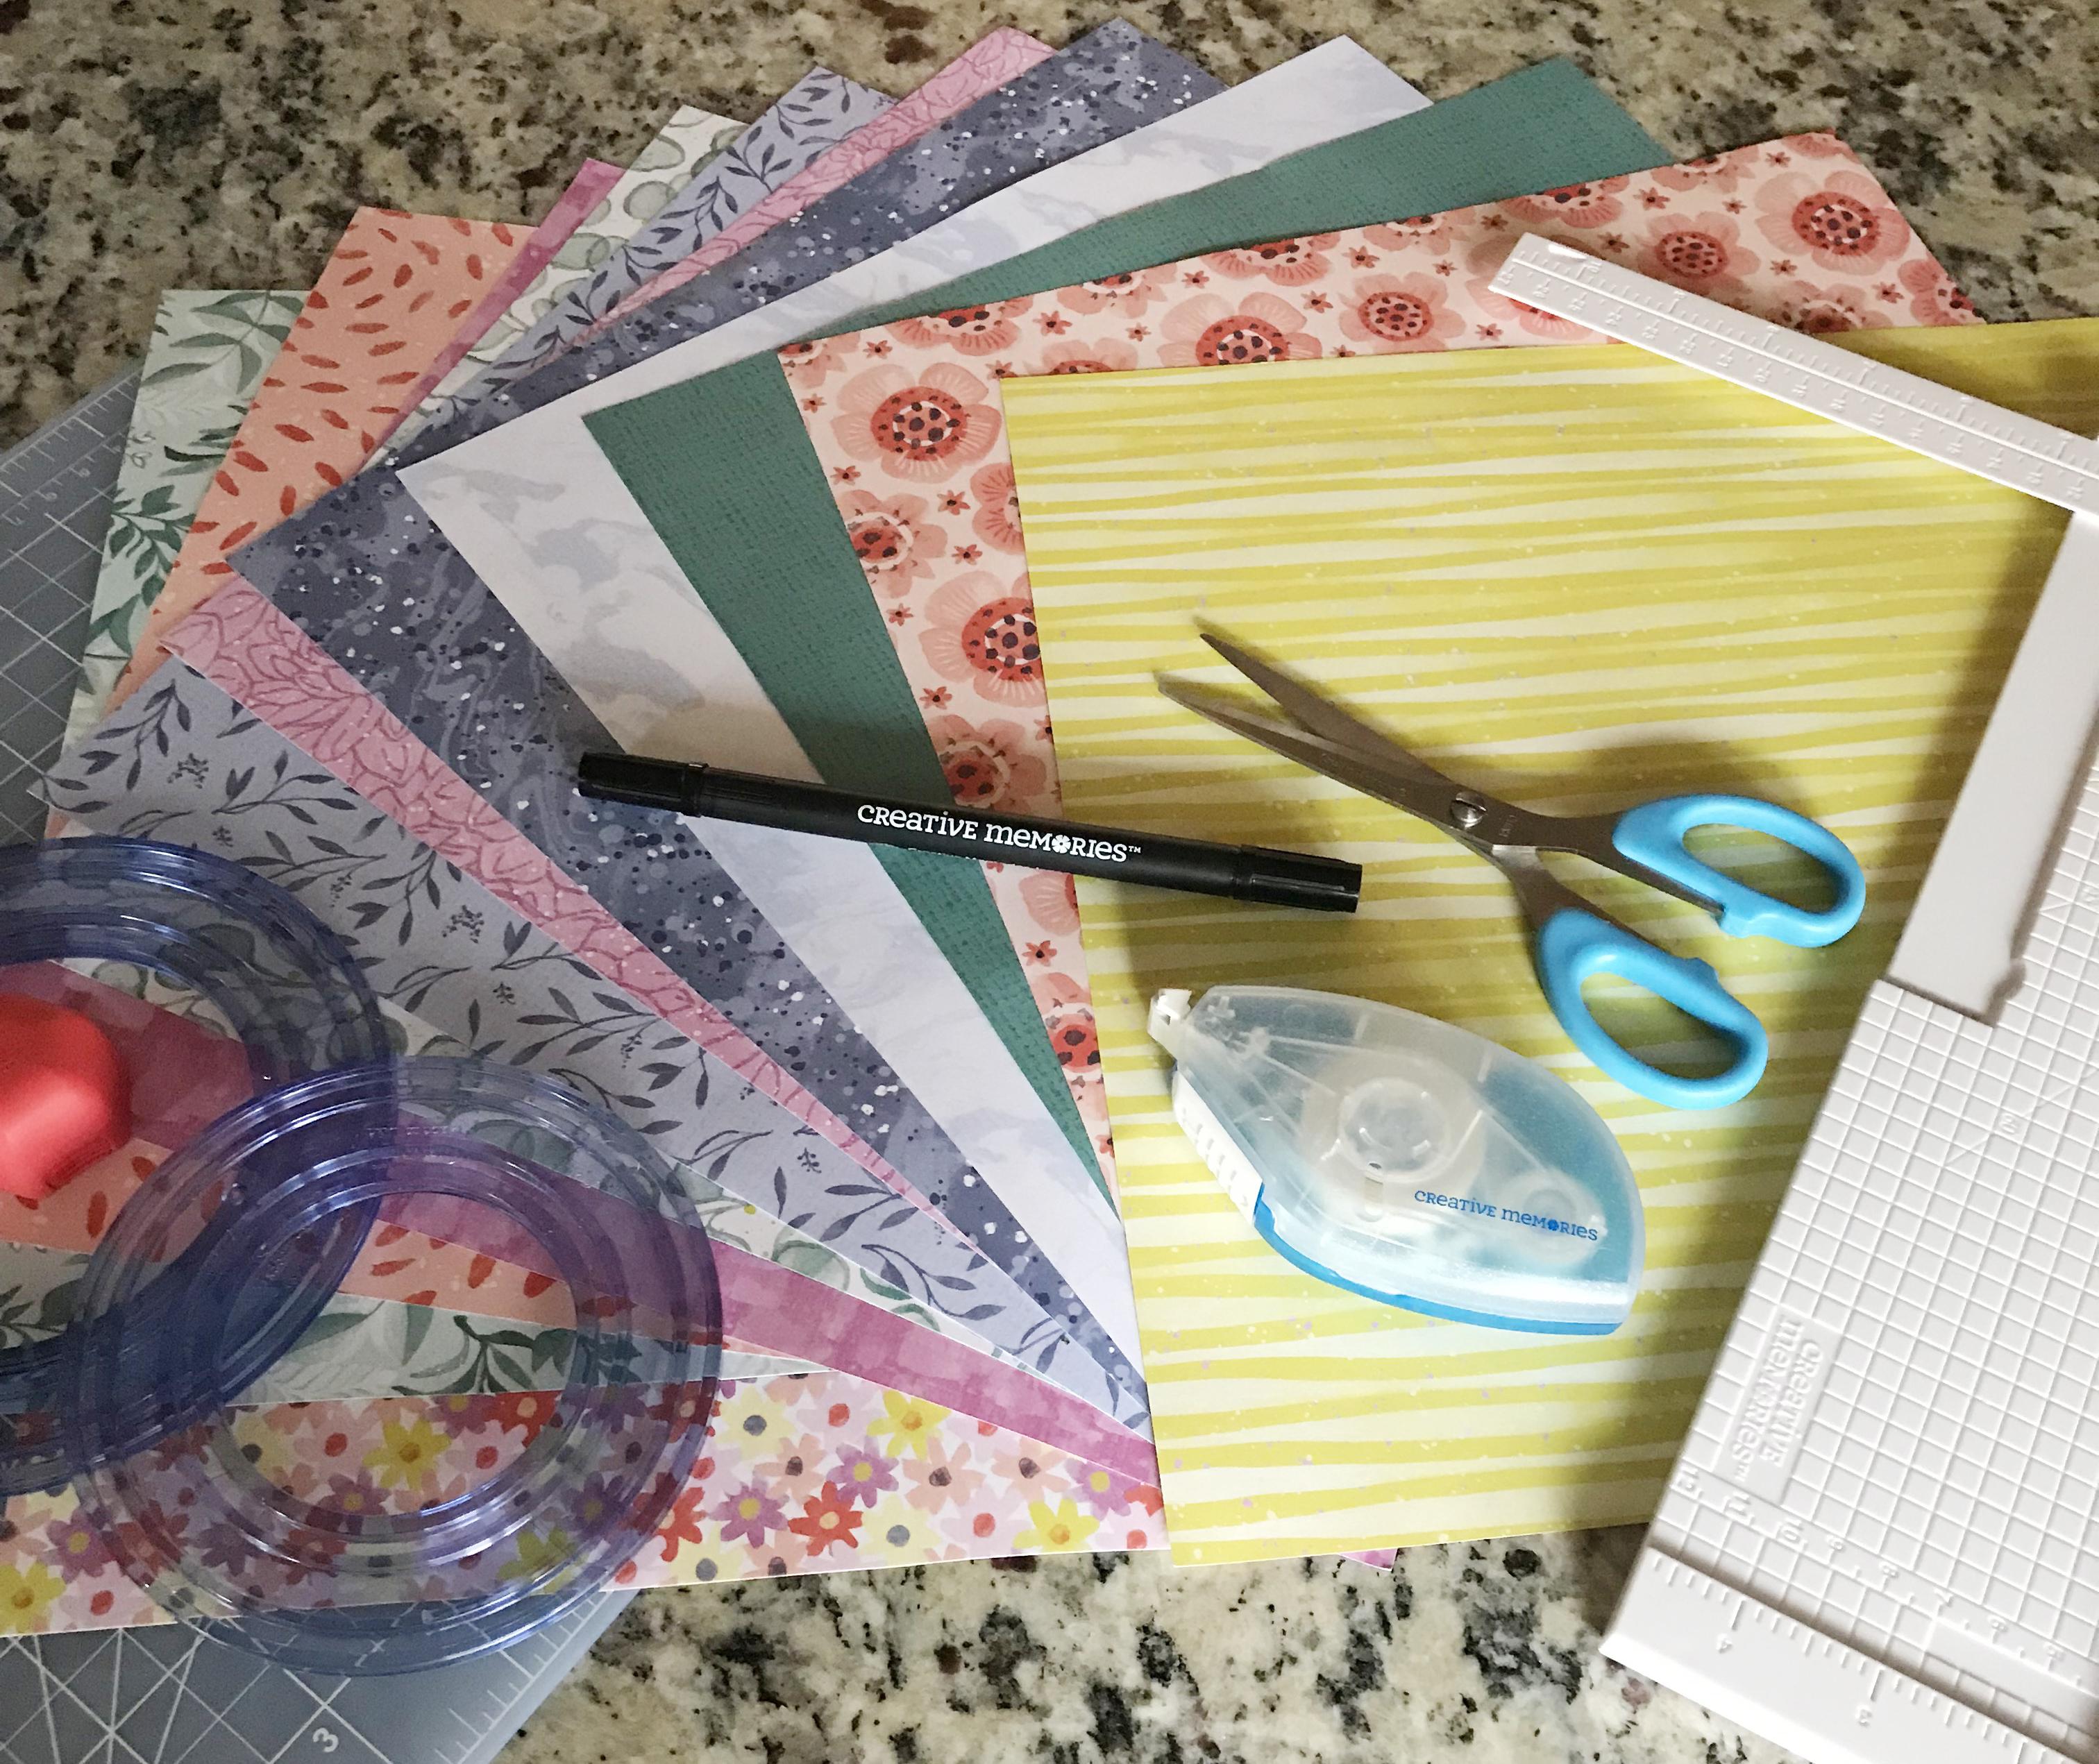 DIY-Paper-Flowers-Full-Bloom-Creative-Memories